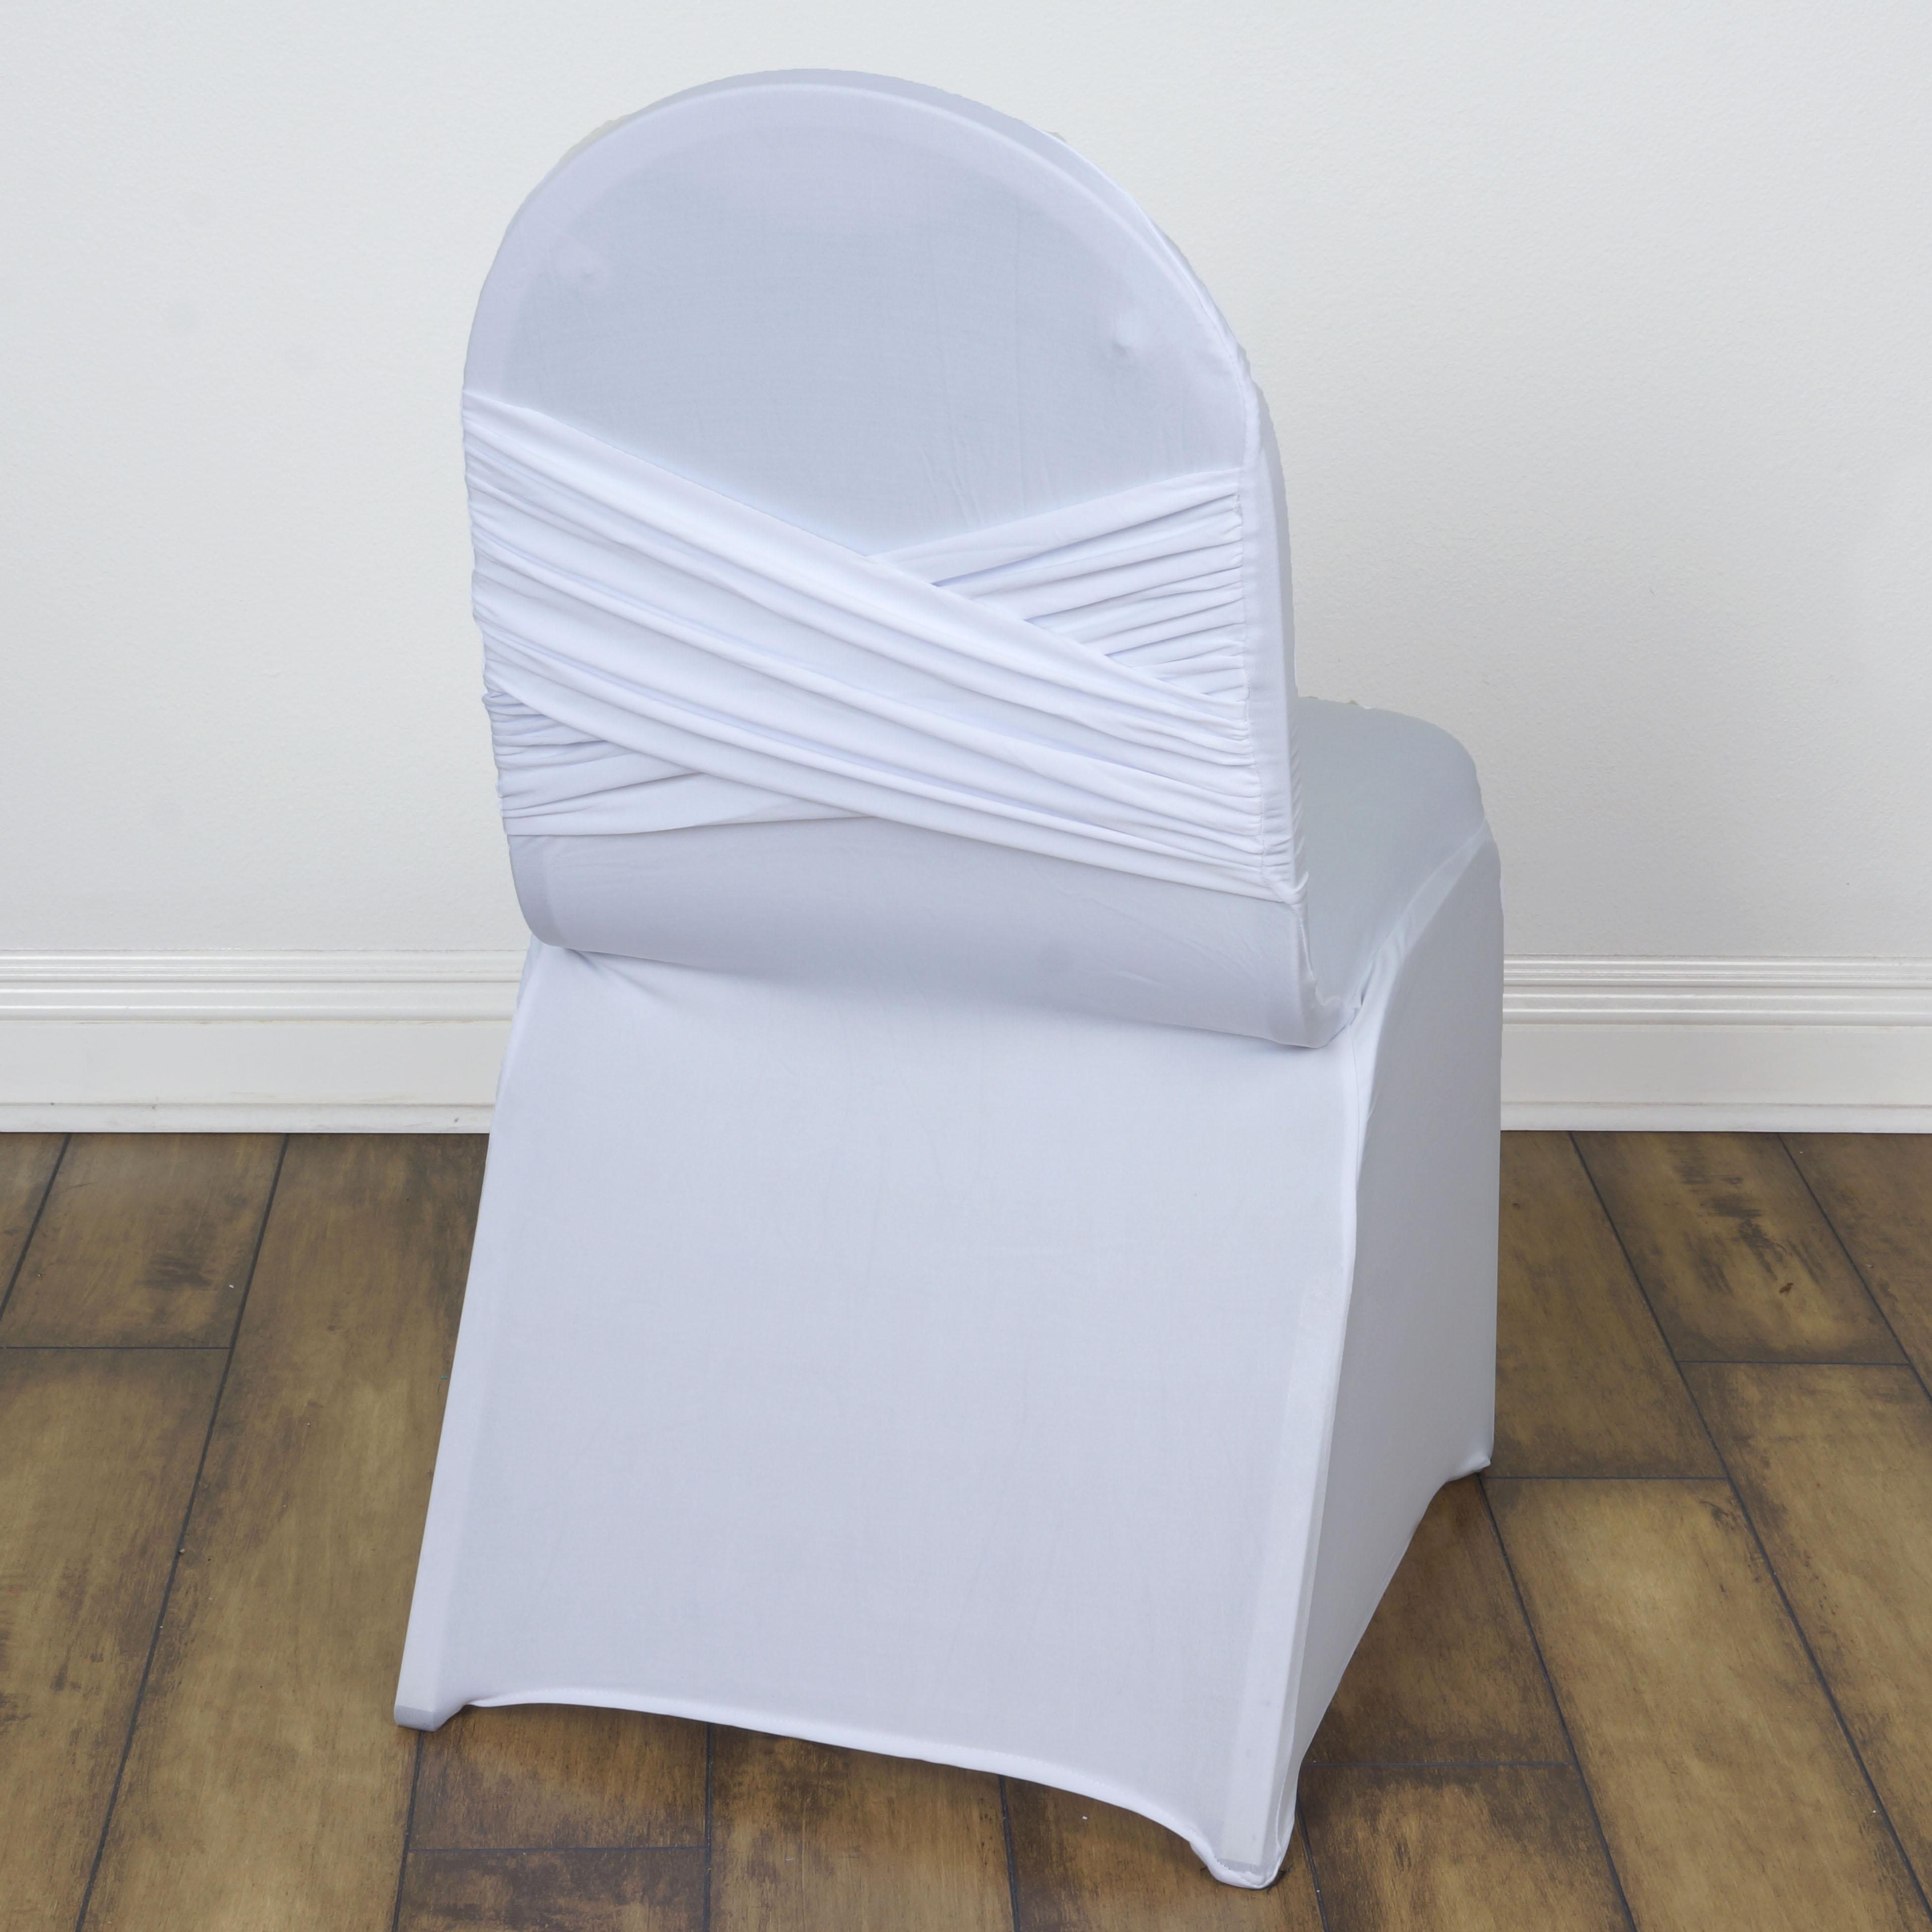 50 pc Spandex Banquet CHAIR COVER Stretchable Crisscross Design